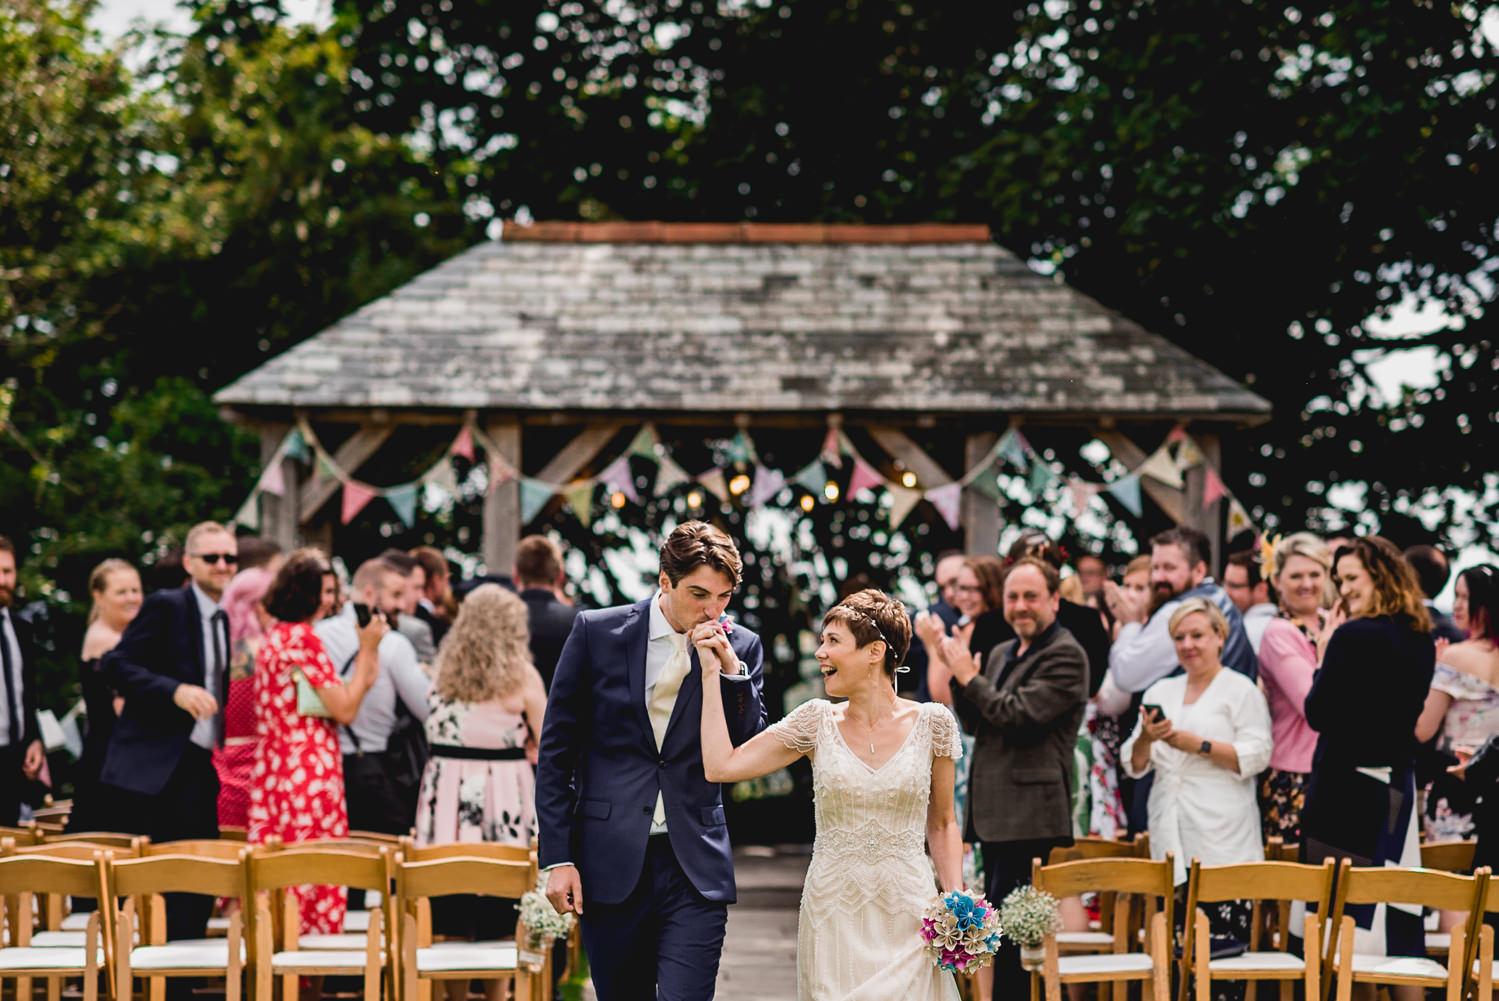 trevenna wedding photo kiss